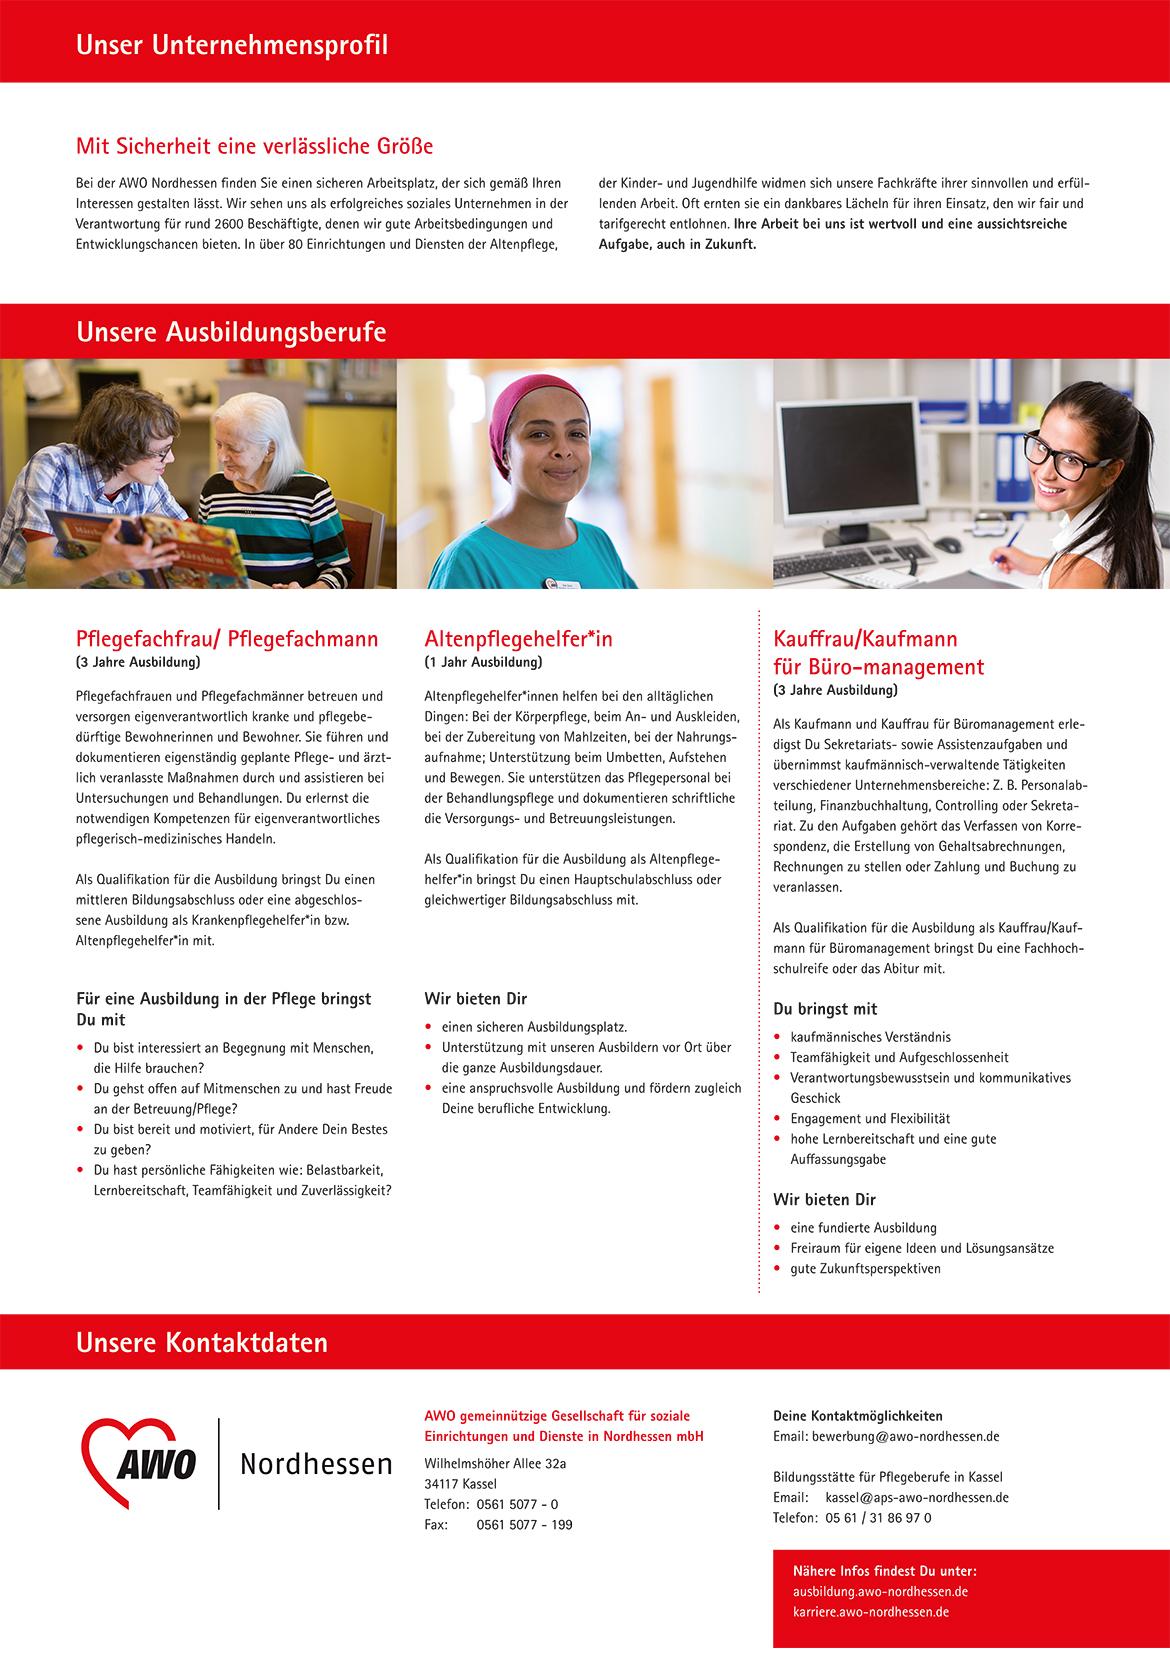 Ausbildungsplakat: AWO Nordhessen